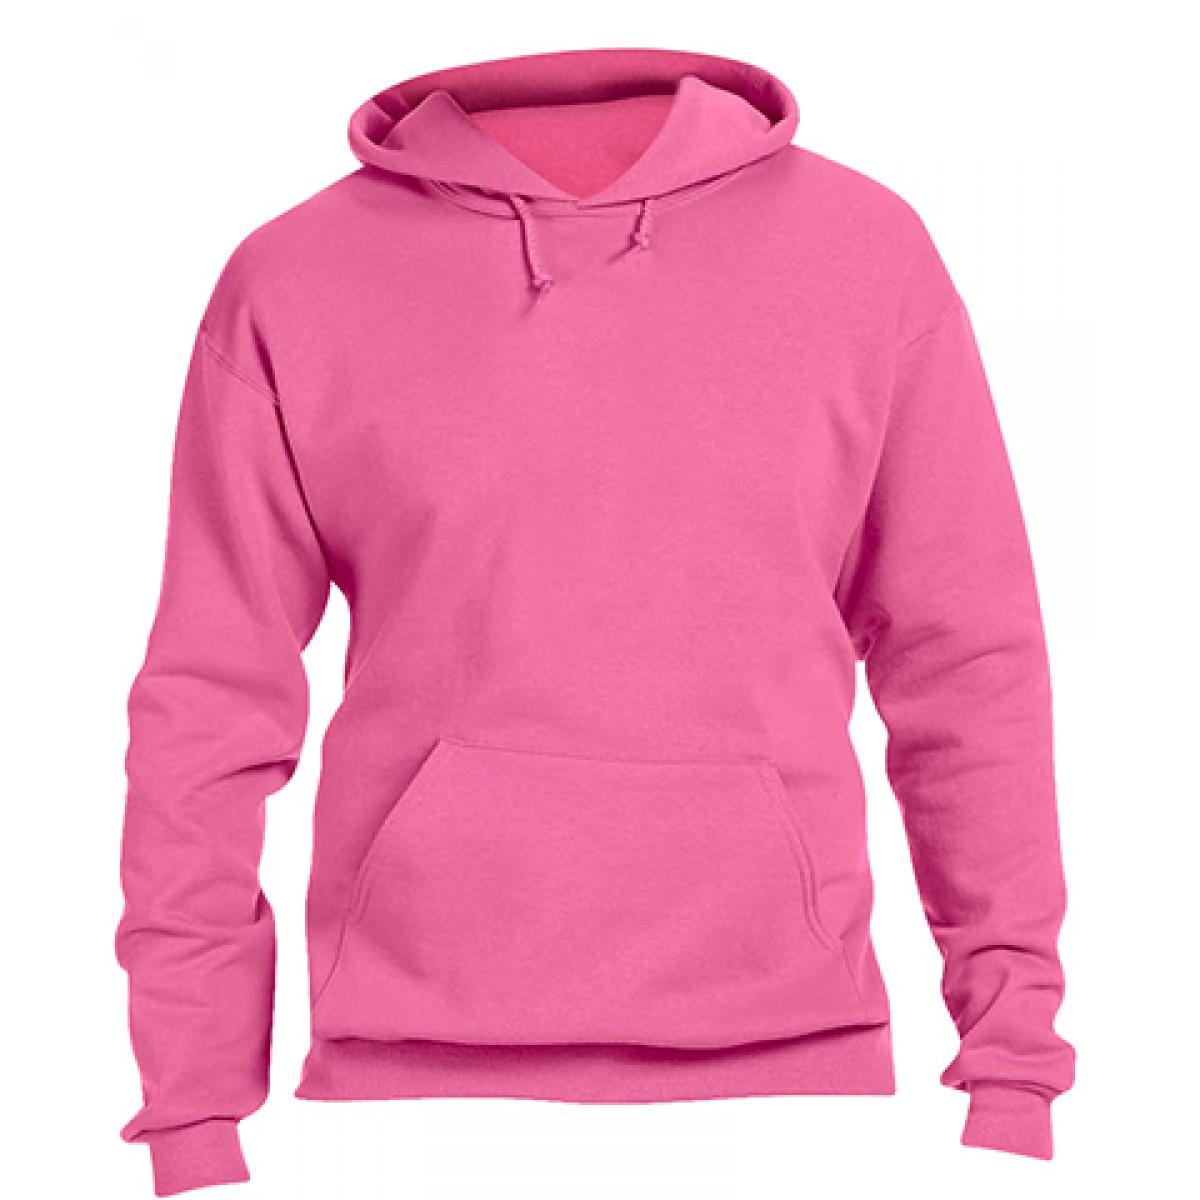 Pullover Hood 50/50 Preshrunk Fleece-Neon-Pink-4XL